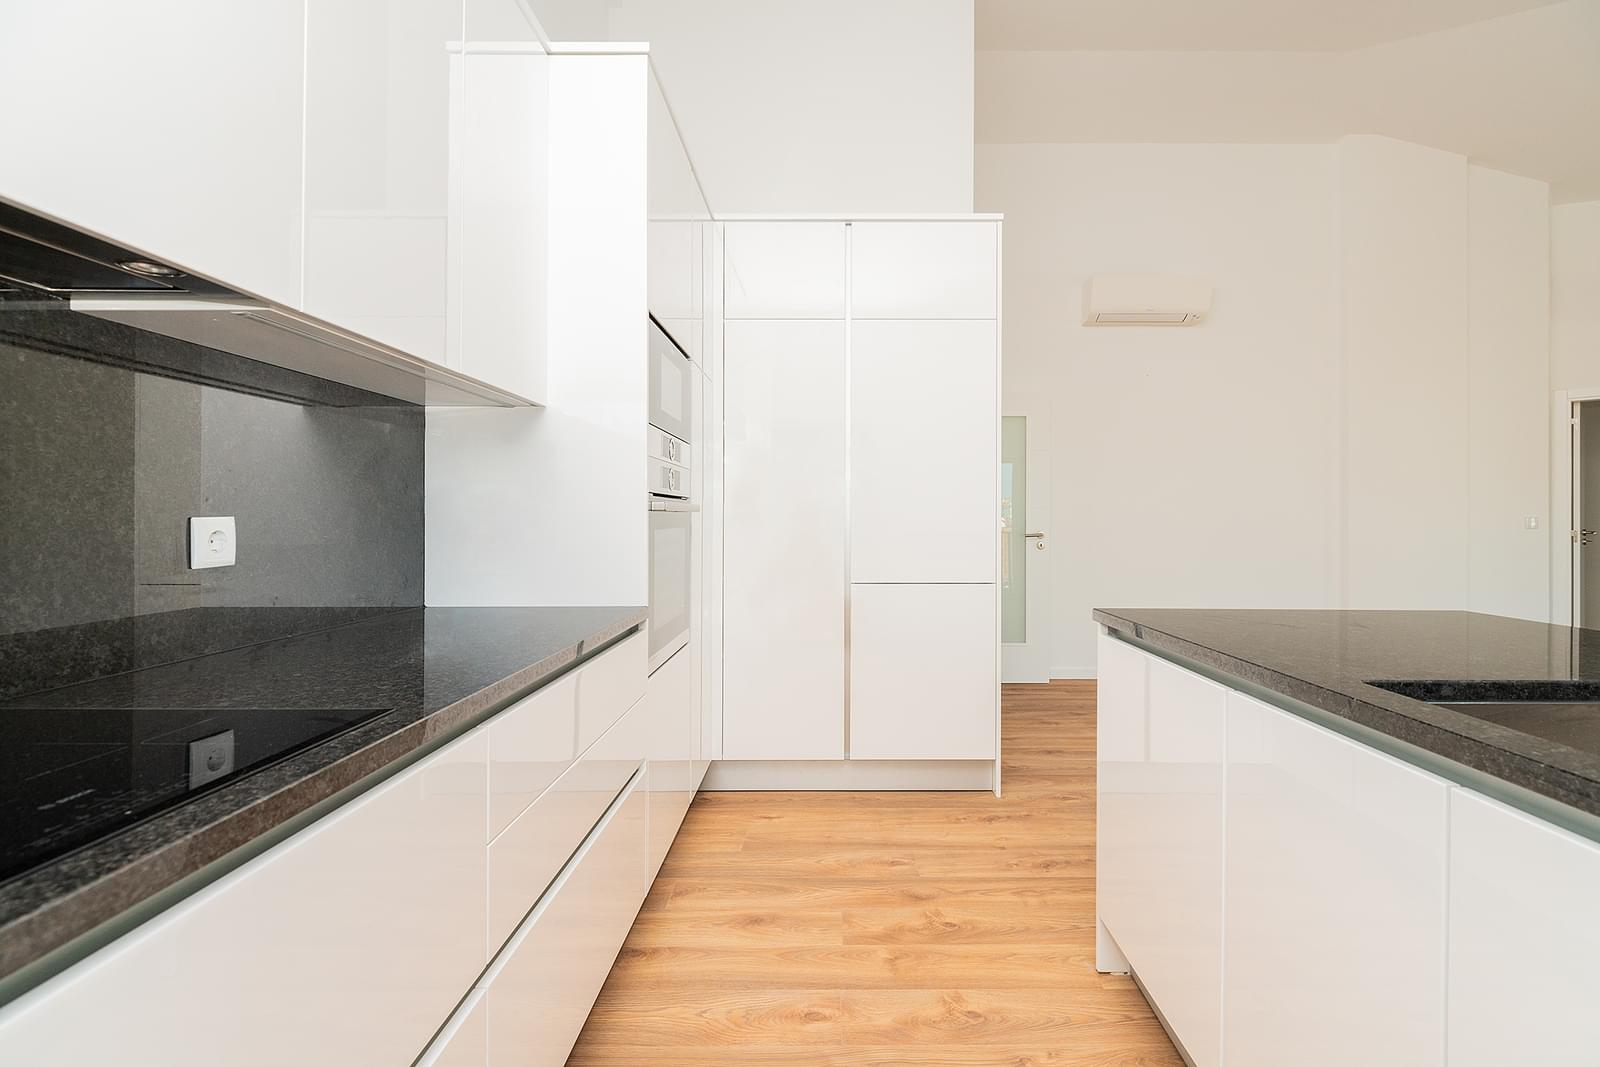 pf18413-apartamento-t1-lisboa-a36c1ac4-adca-4207-8451-f2571eb46703